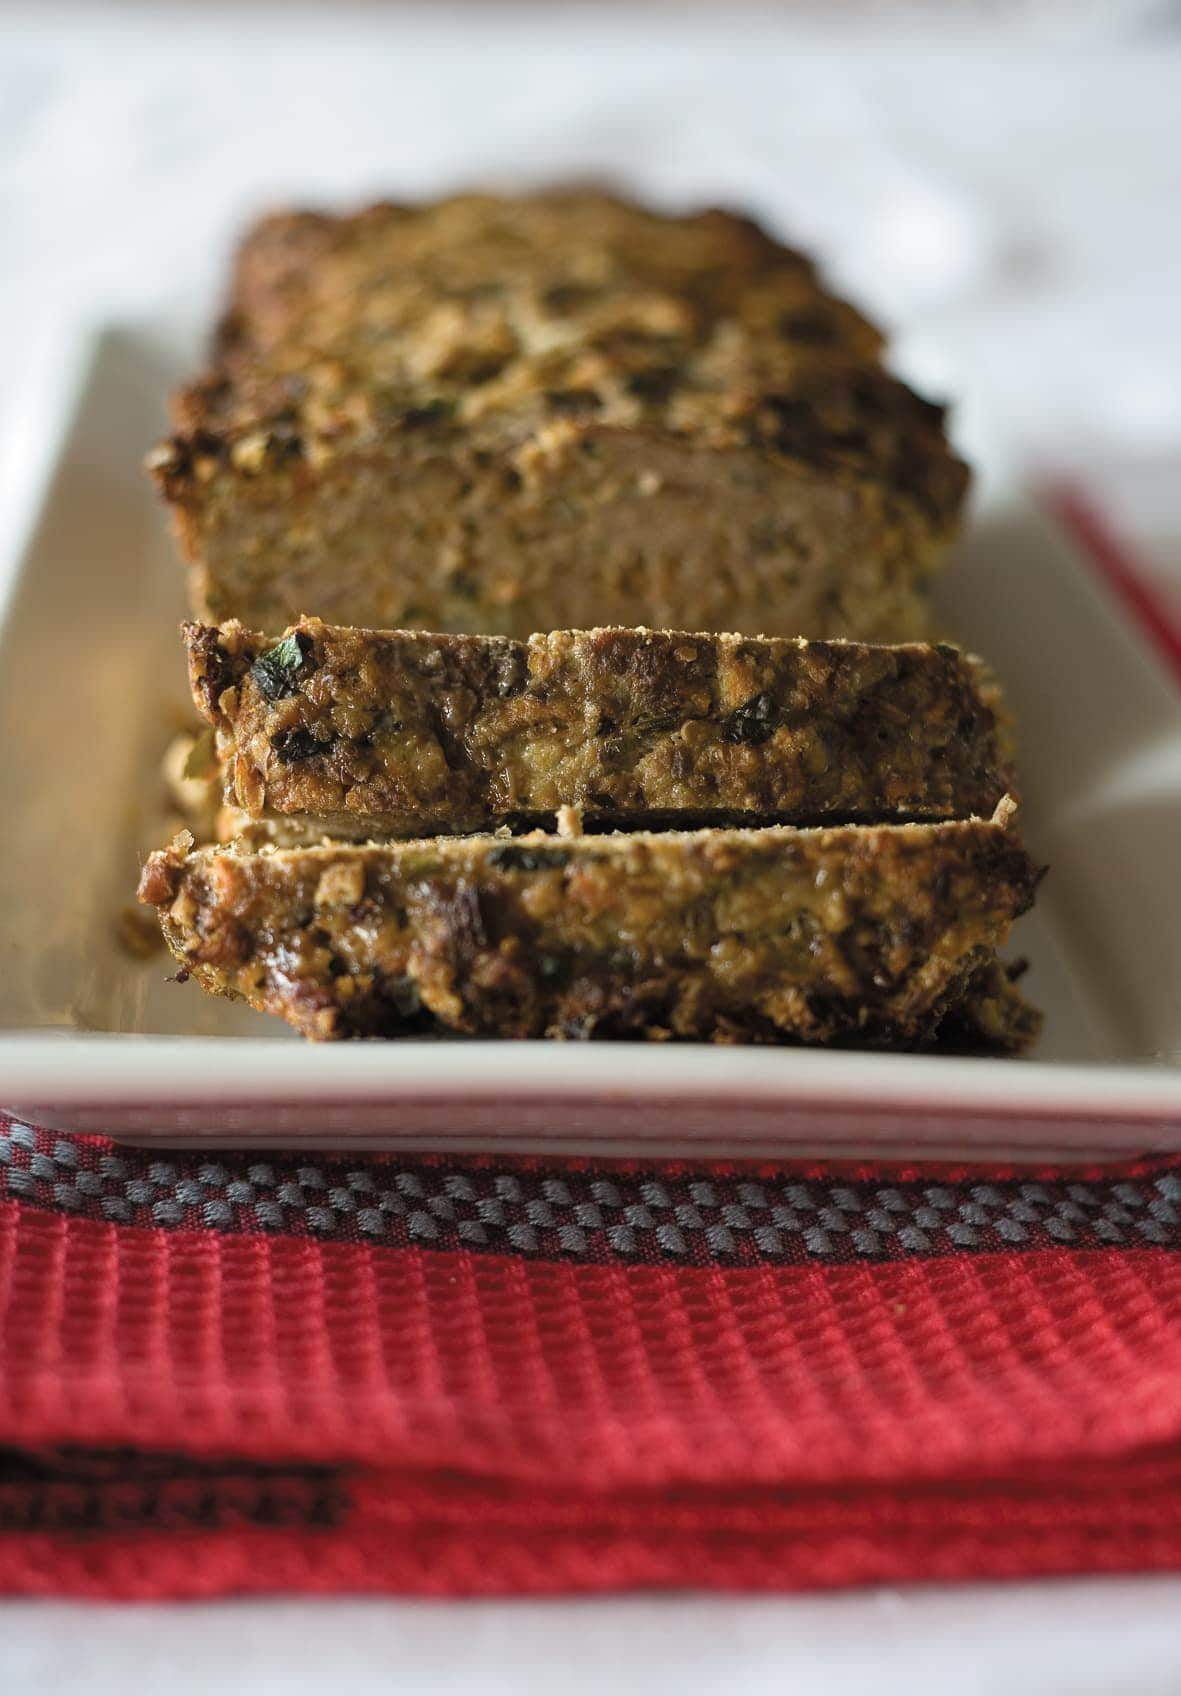 Hfg meat loaf healthy food guide hfg meat loaf forumfinder Image collections